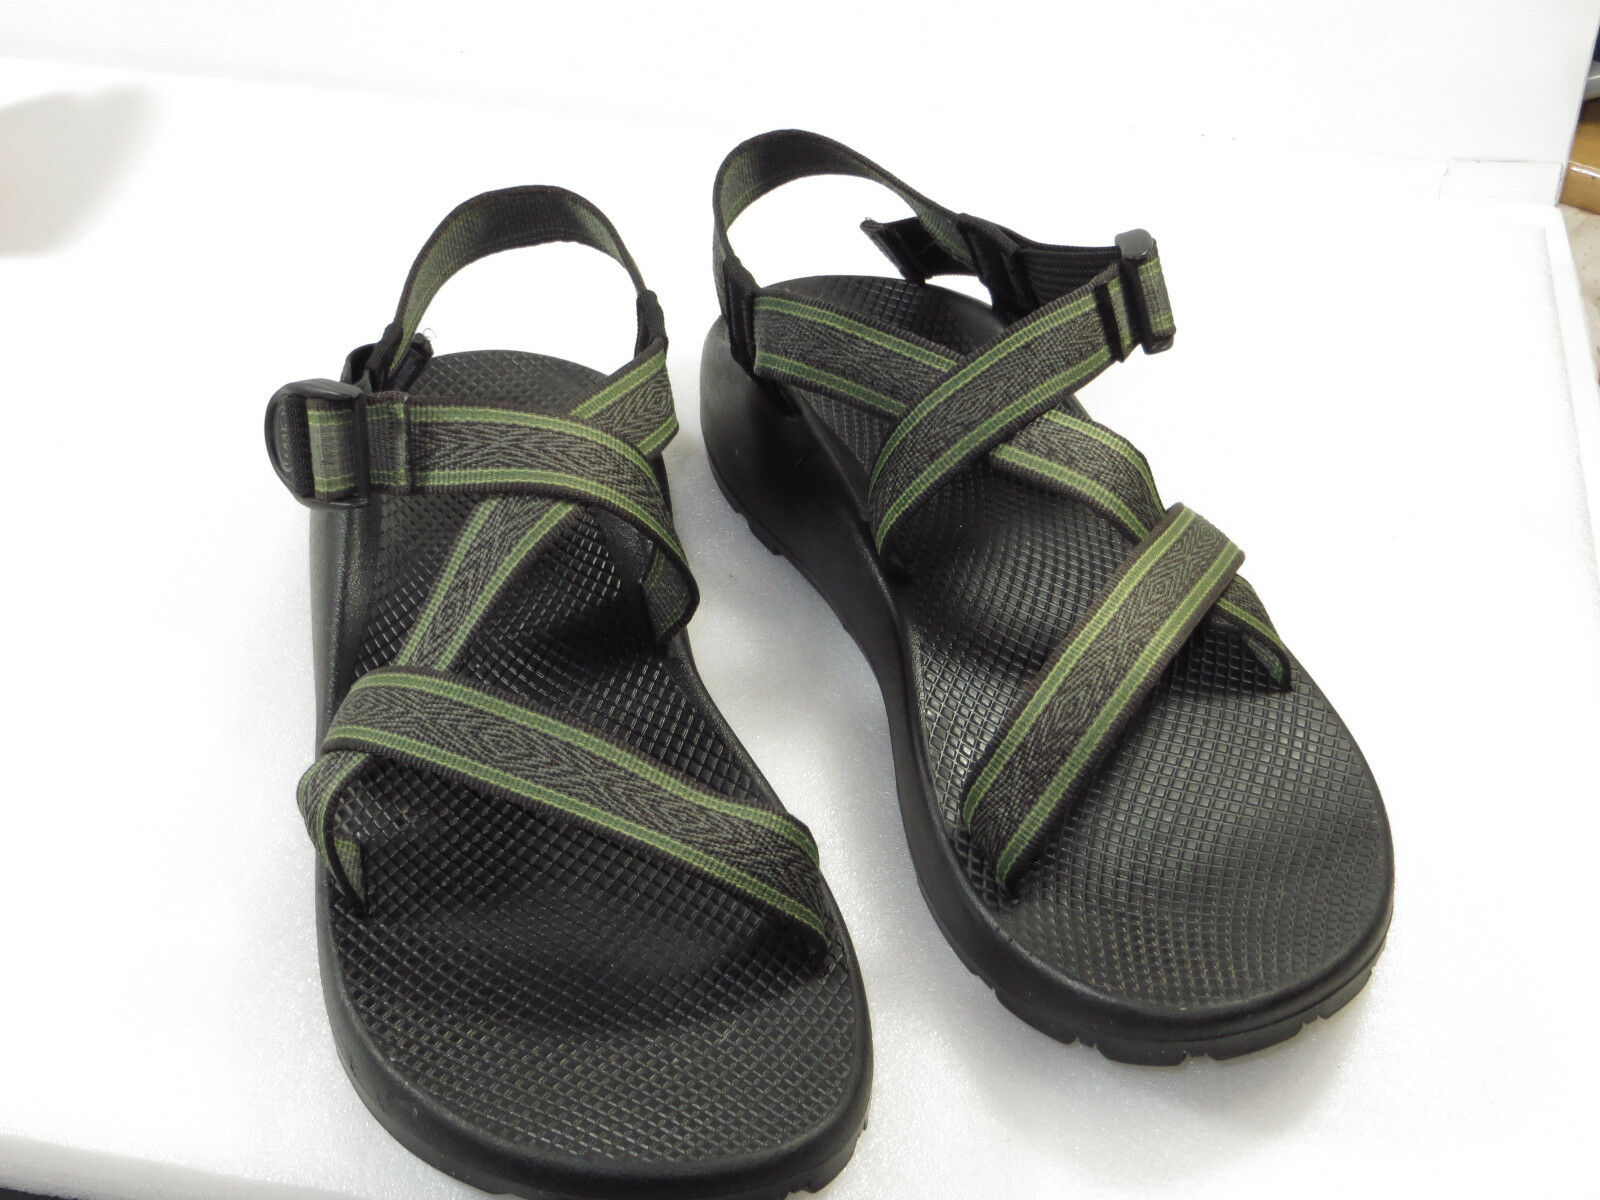 GR8  cond men's CHACO Strap Sandals Sport Adjustable Size U.S M 14